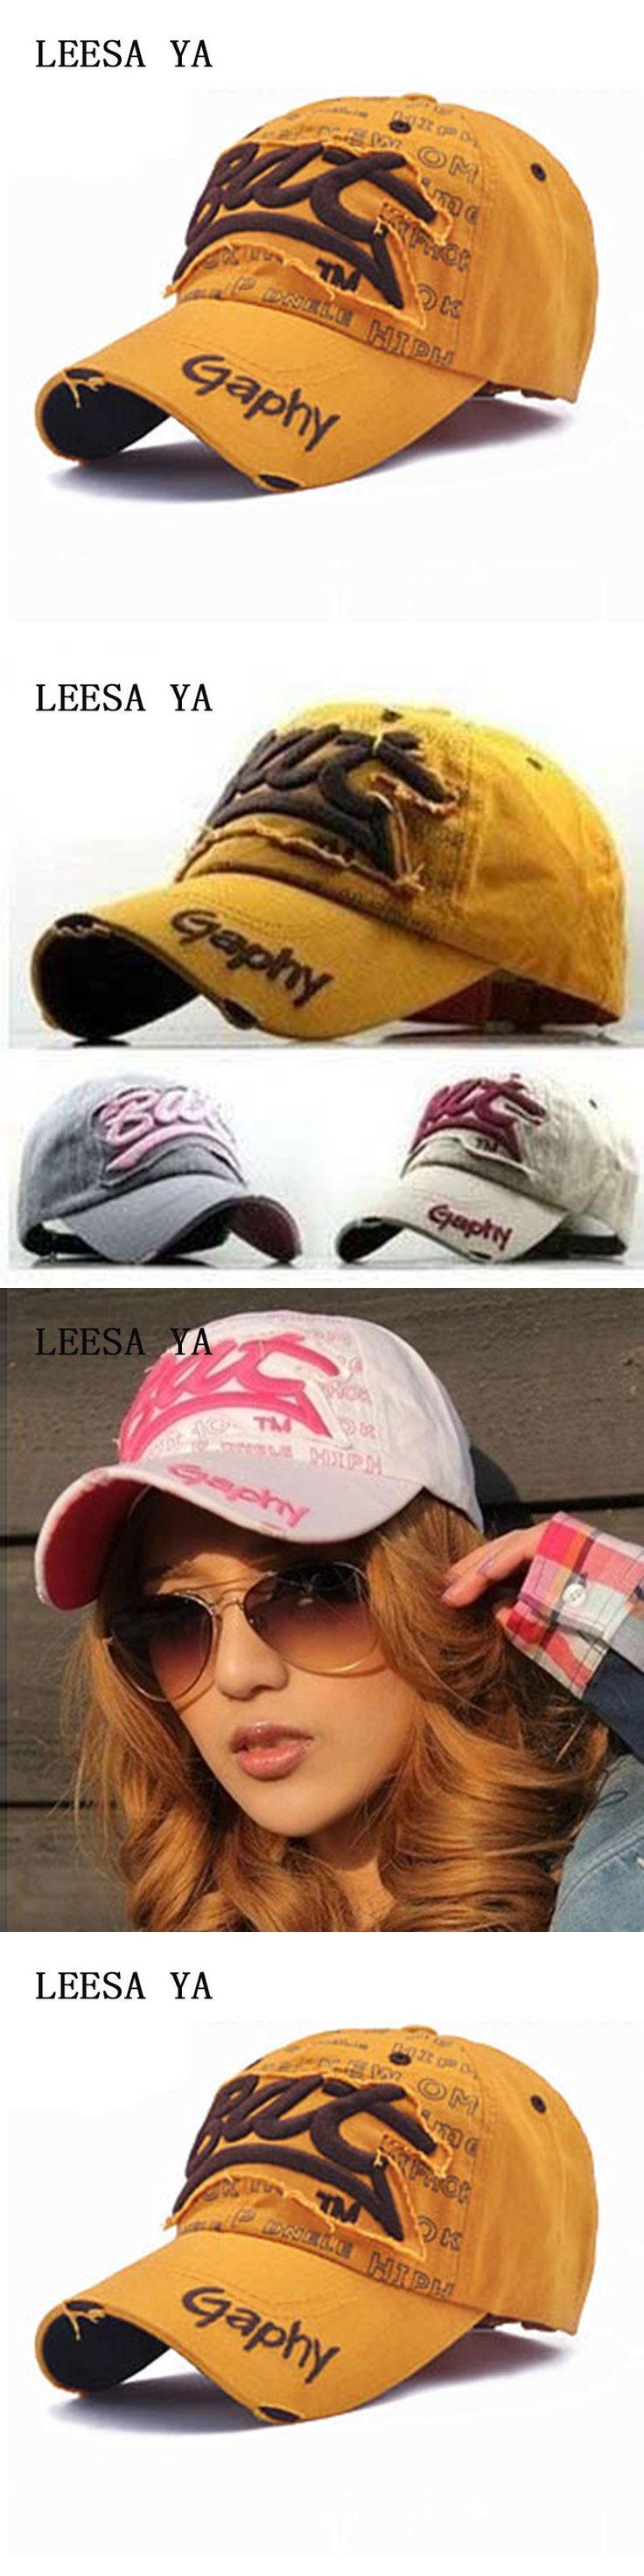 Fashion embroidery Letter Baseball Caps Men Women Cotton Gorras Snapback Bone Hat Raiders Hat High Quality Brand Polo Caps boy